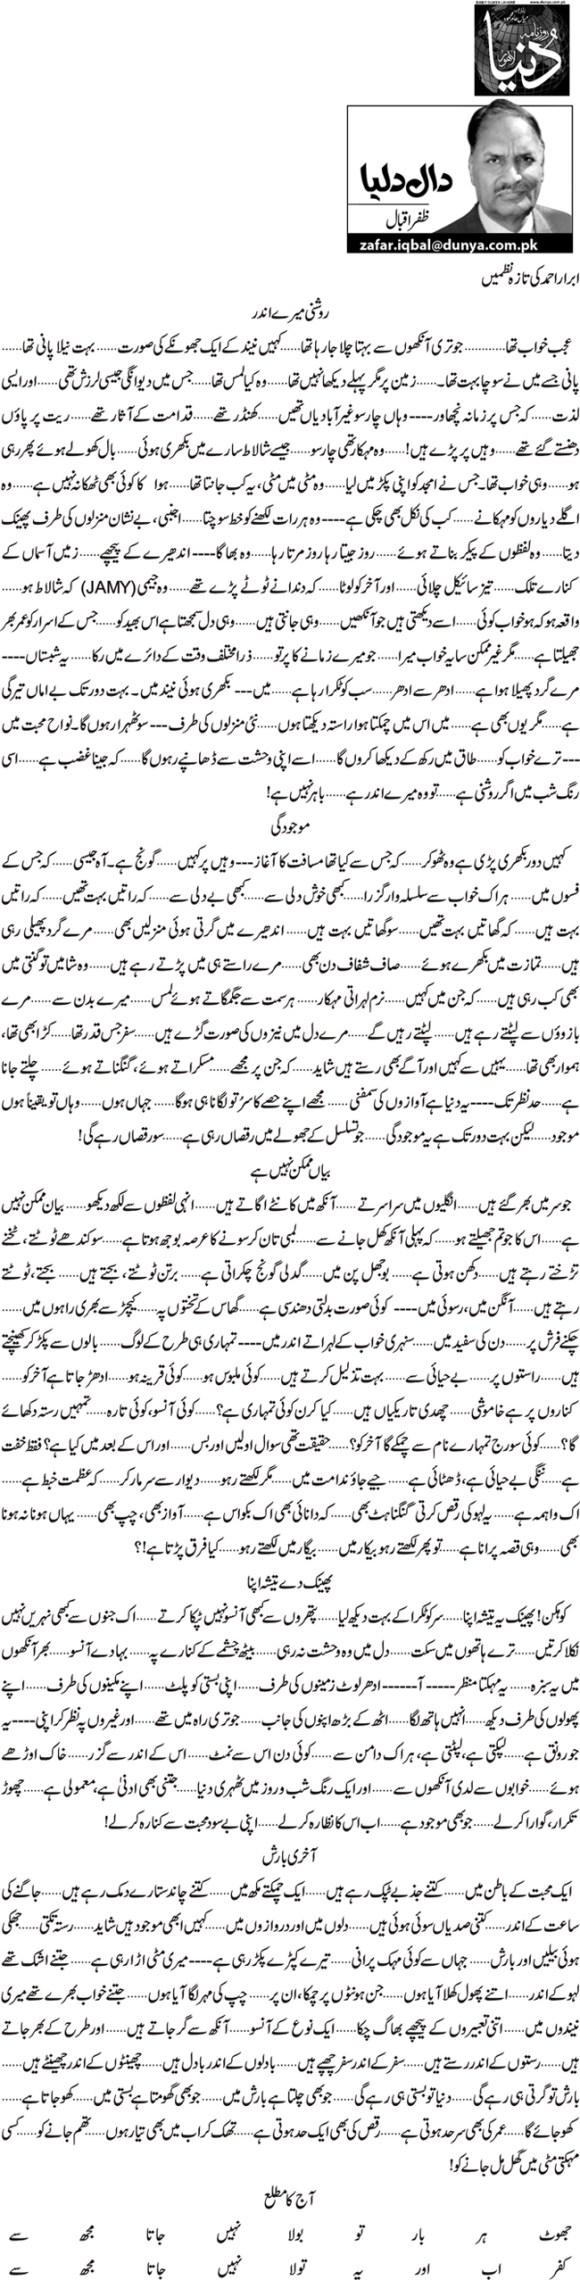 Abrar Ahmed ki taza nazmain - Zafar Iqbal